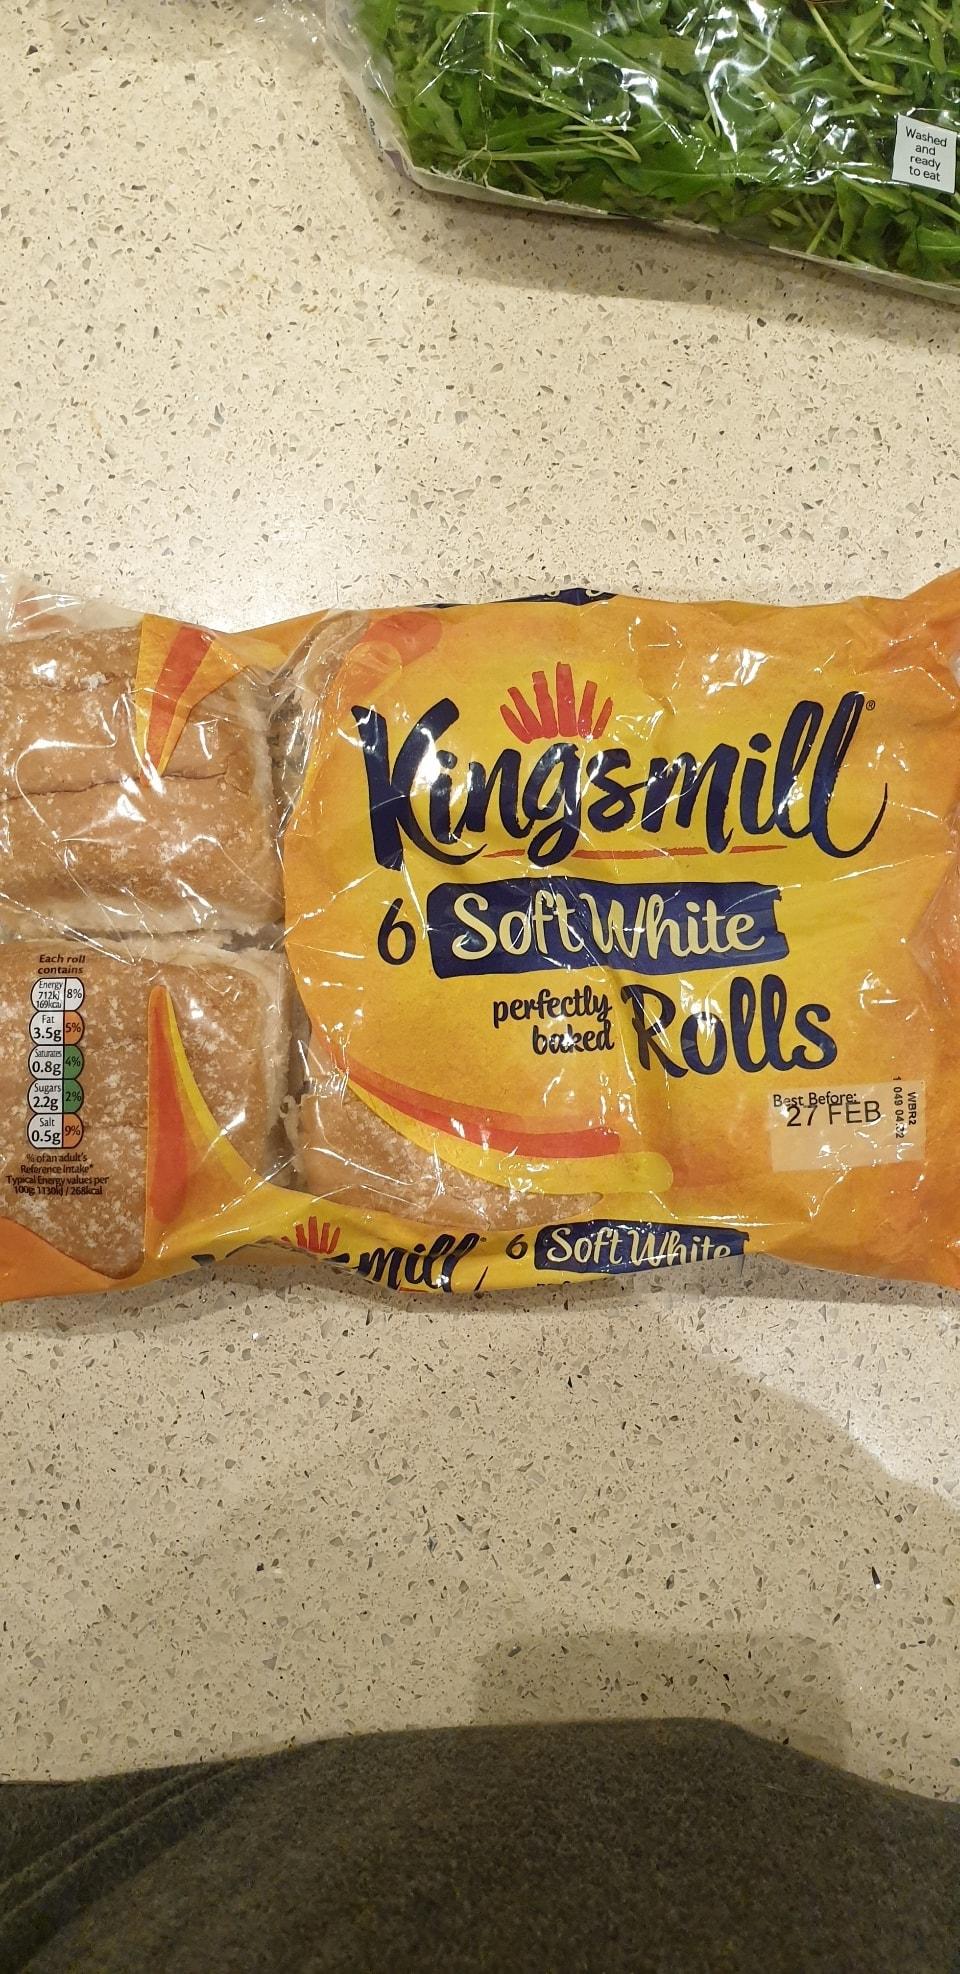 6 Soft white rolls